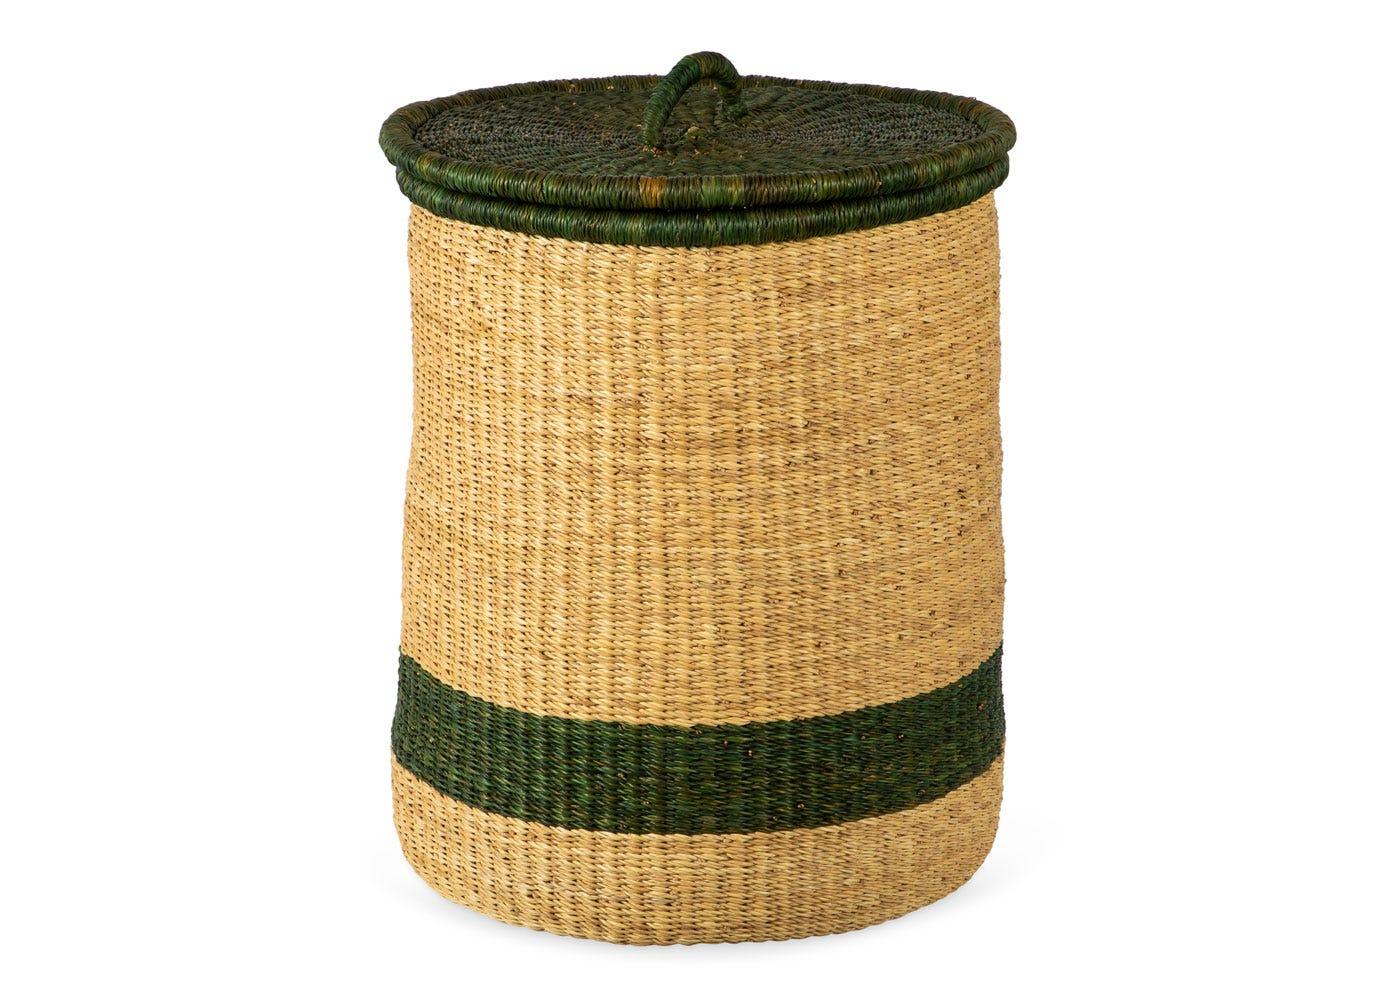 As Shown: Handwoven Laundry Basket in Green Stripe